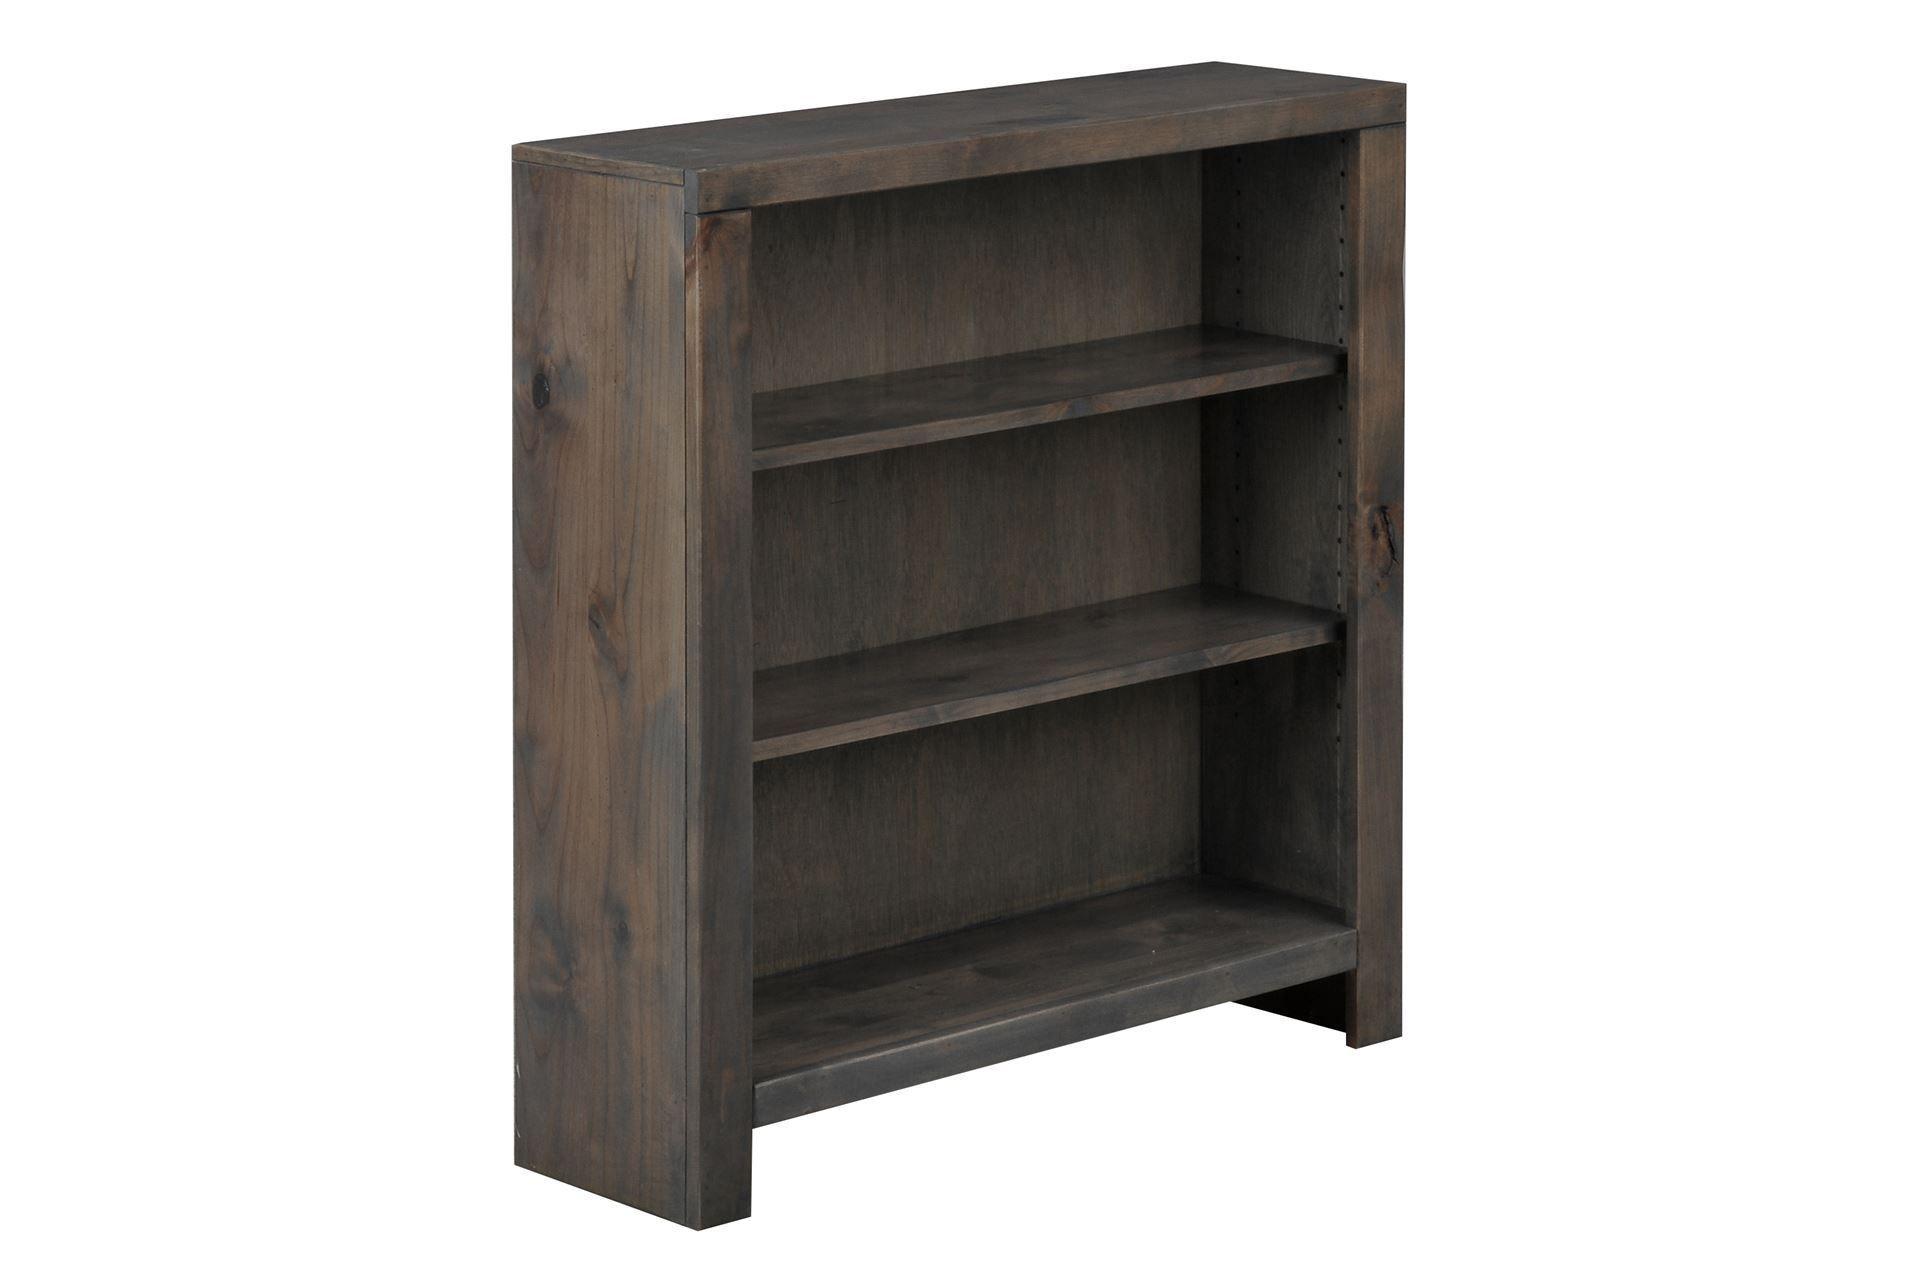 Ducar Ii 36 Inch Bookcase In 2020 Bookcase Tall Bookcases Barn